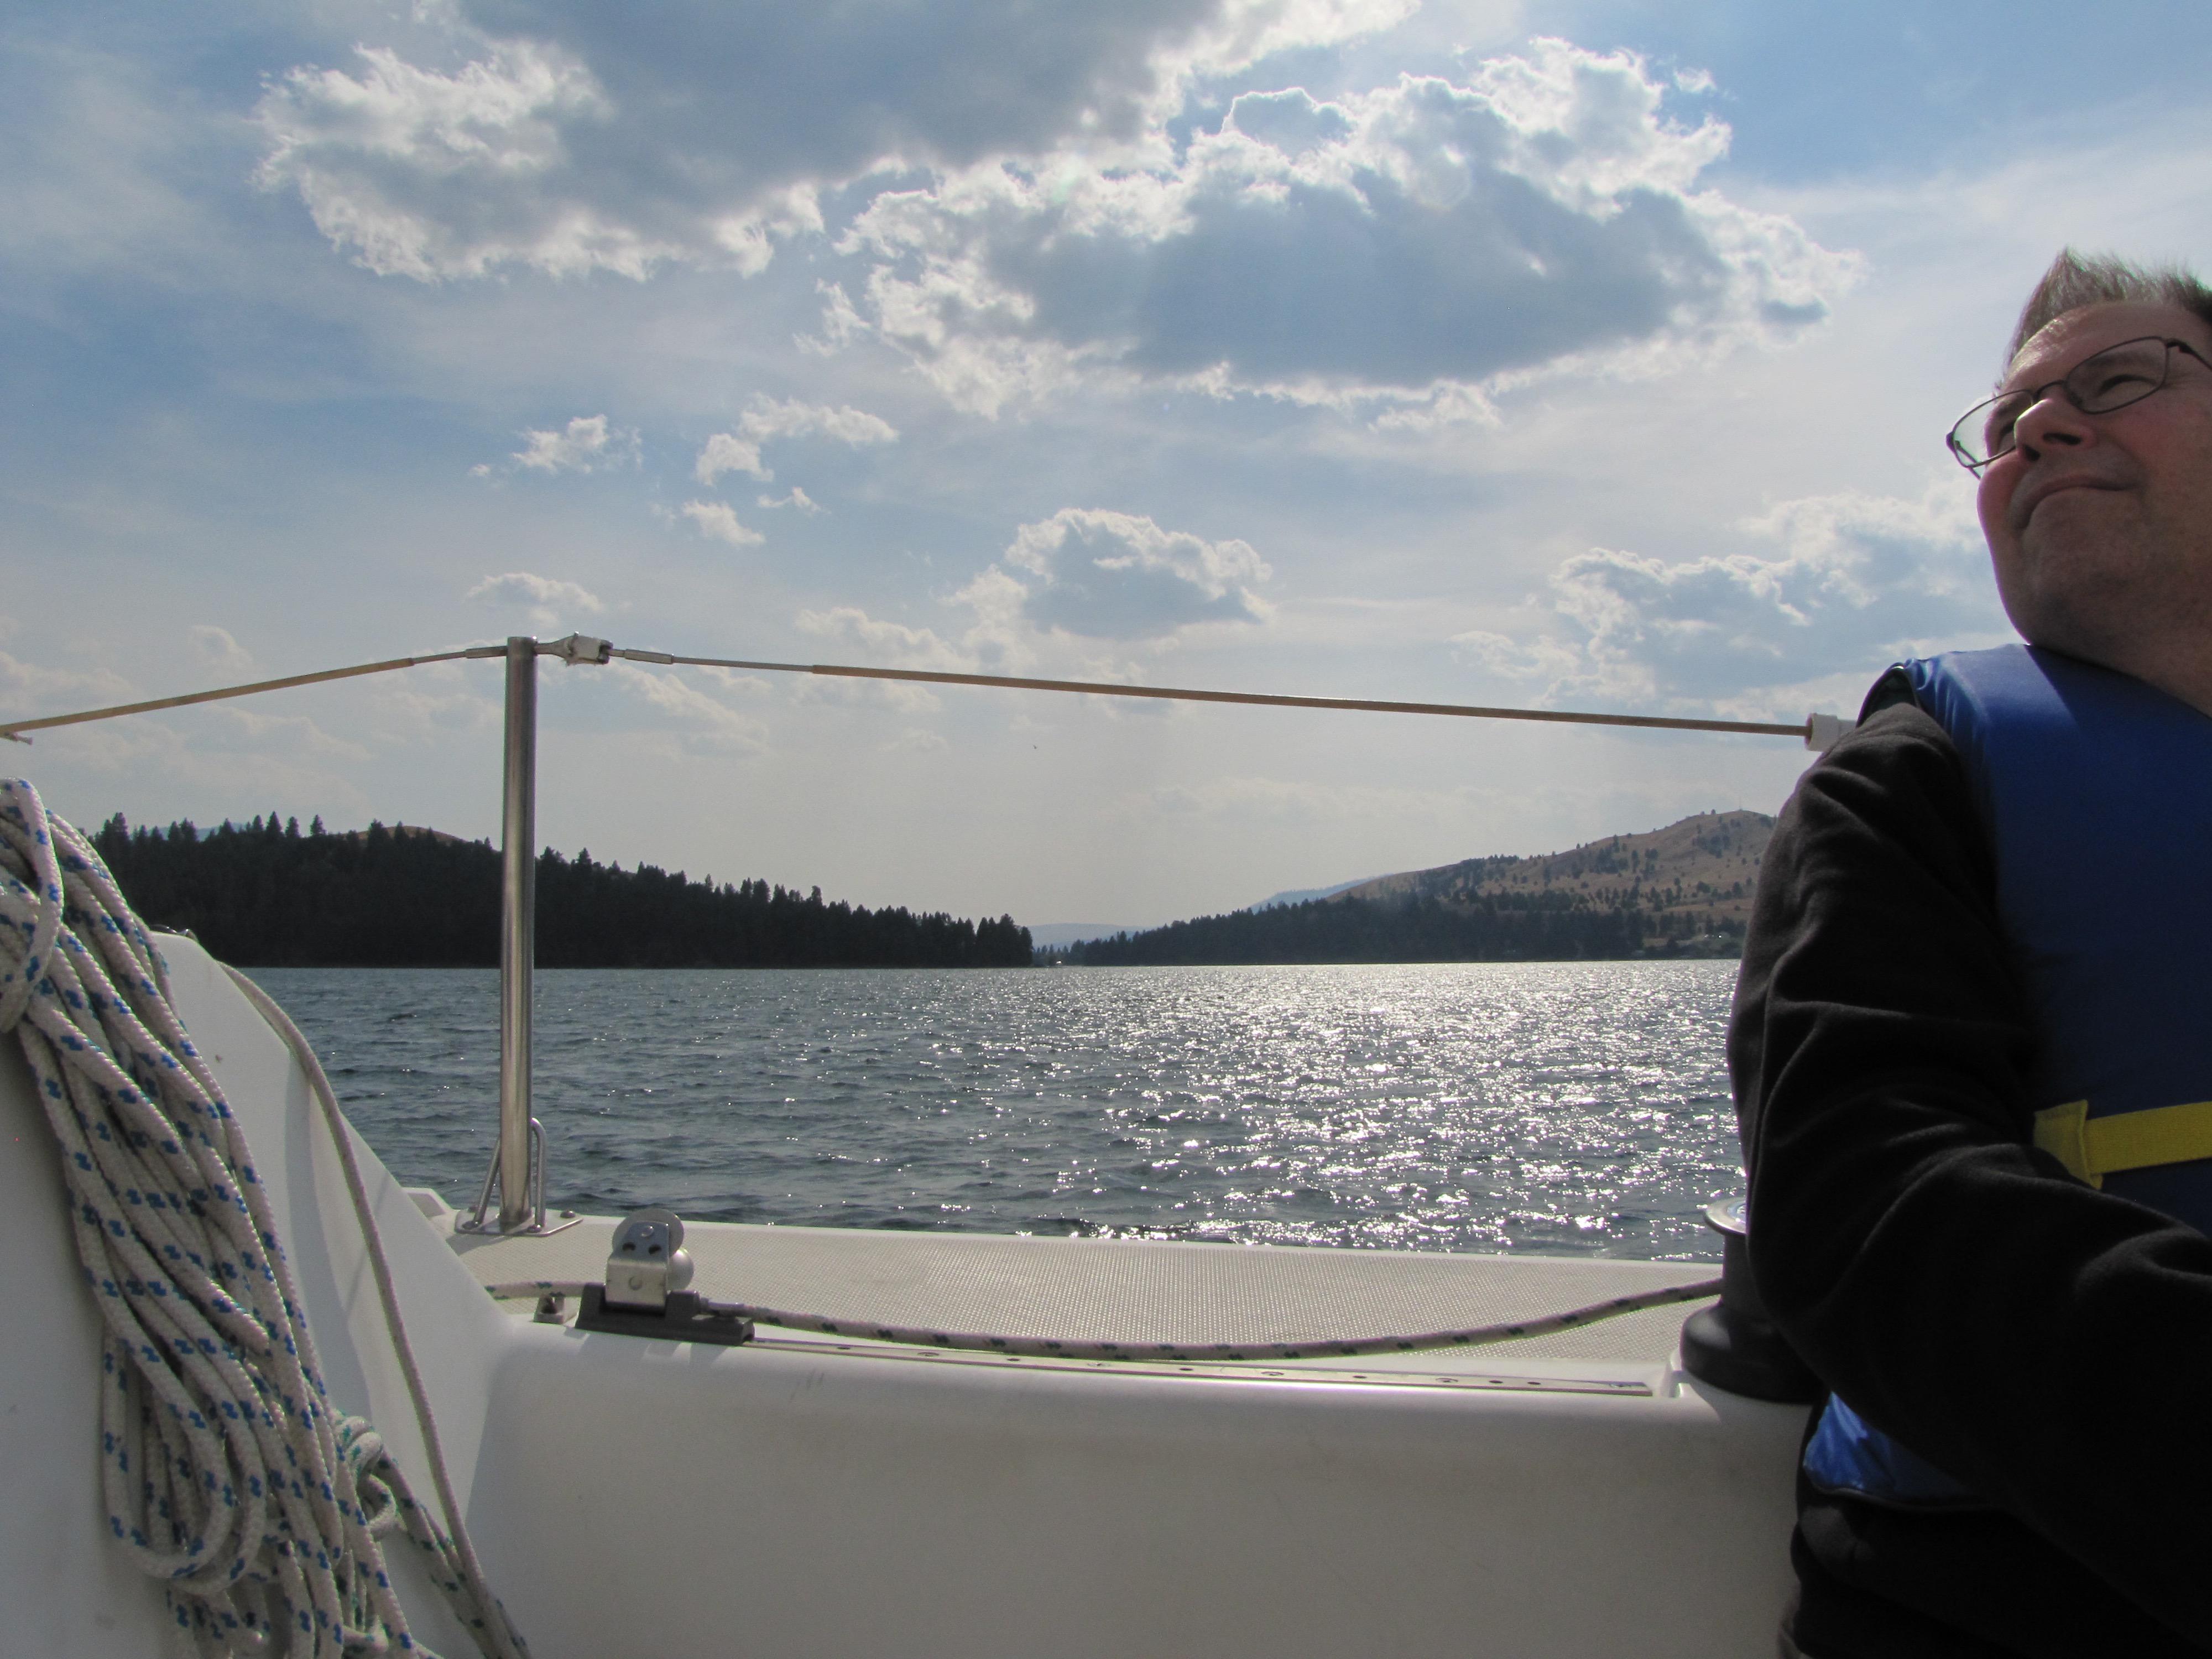 Sailing on Flathead Lake